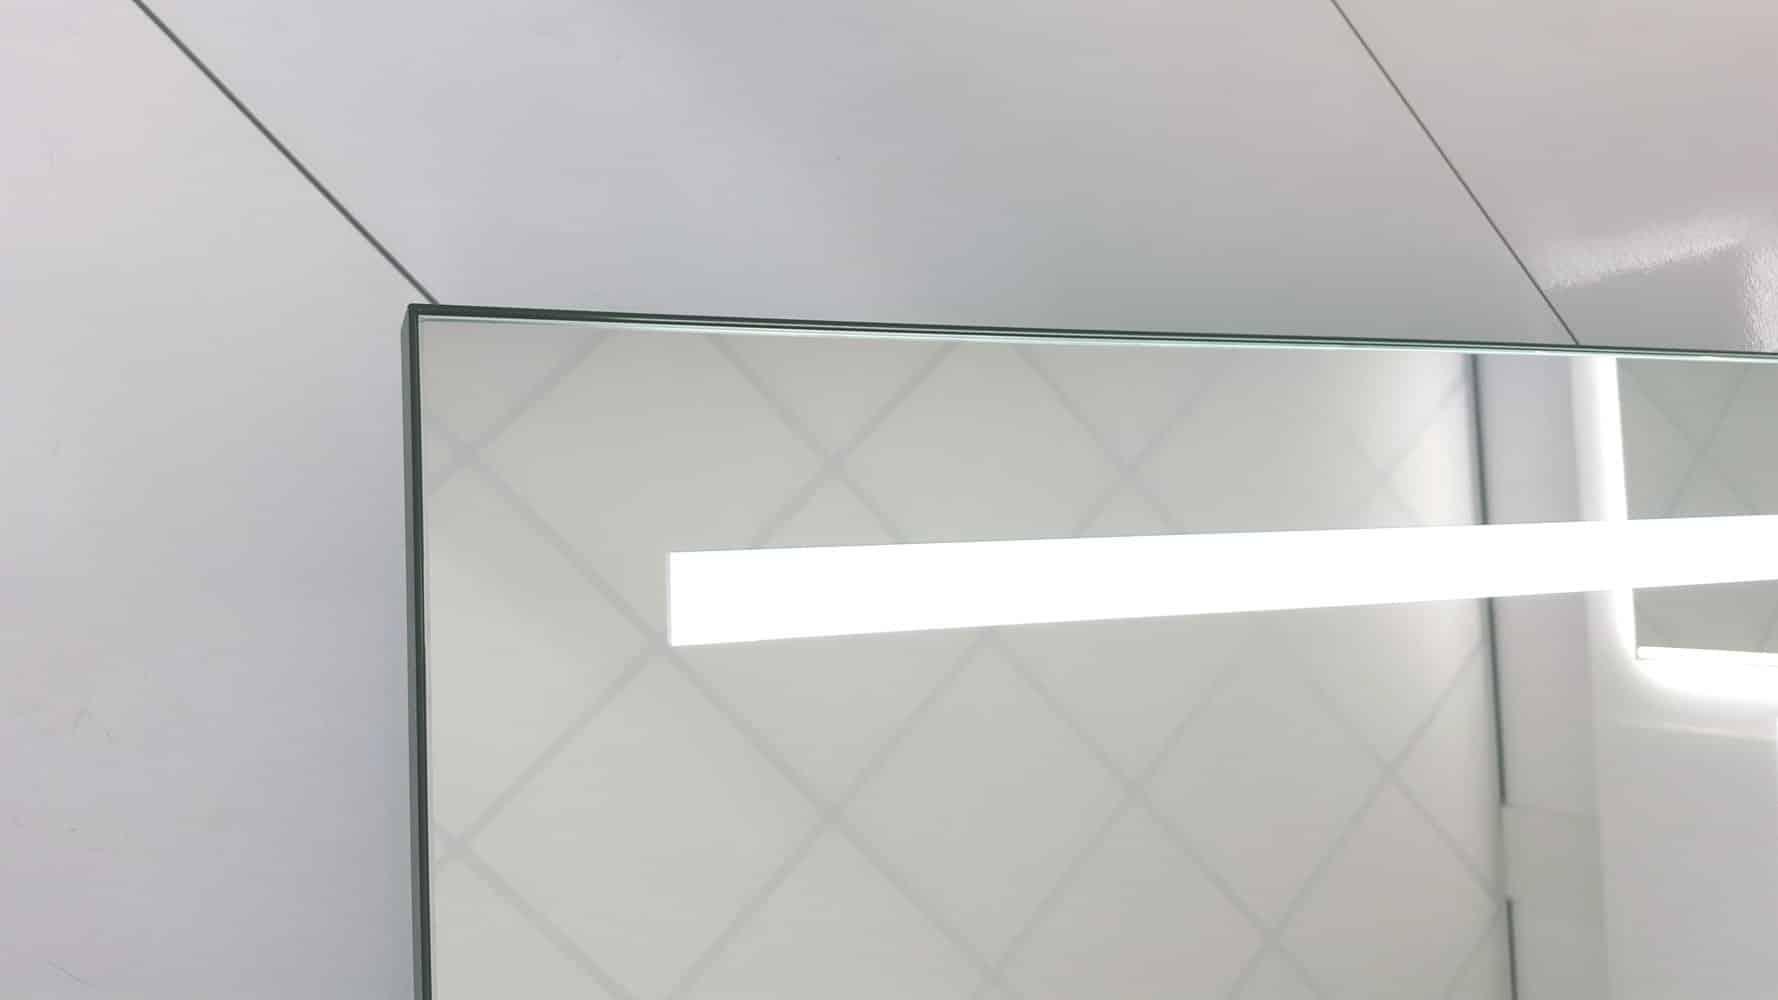 Spiegel Verlichting Badkamer : Industriële badkamer spiegel met stoer mat zwart frame en